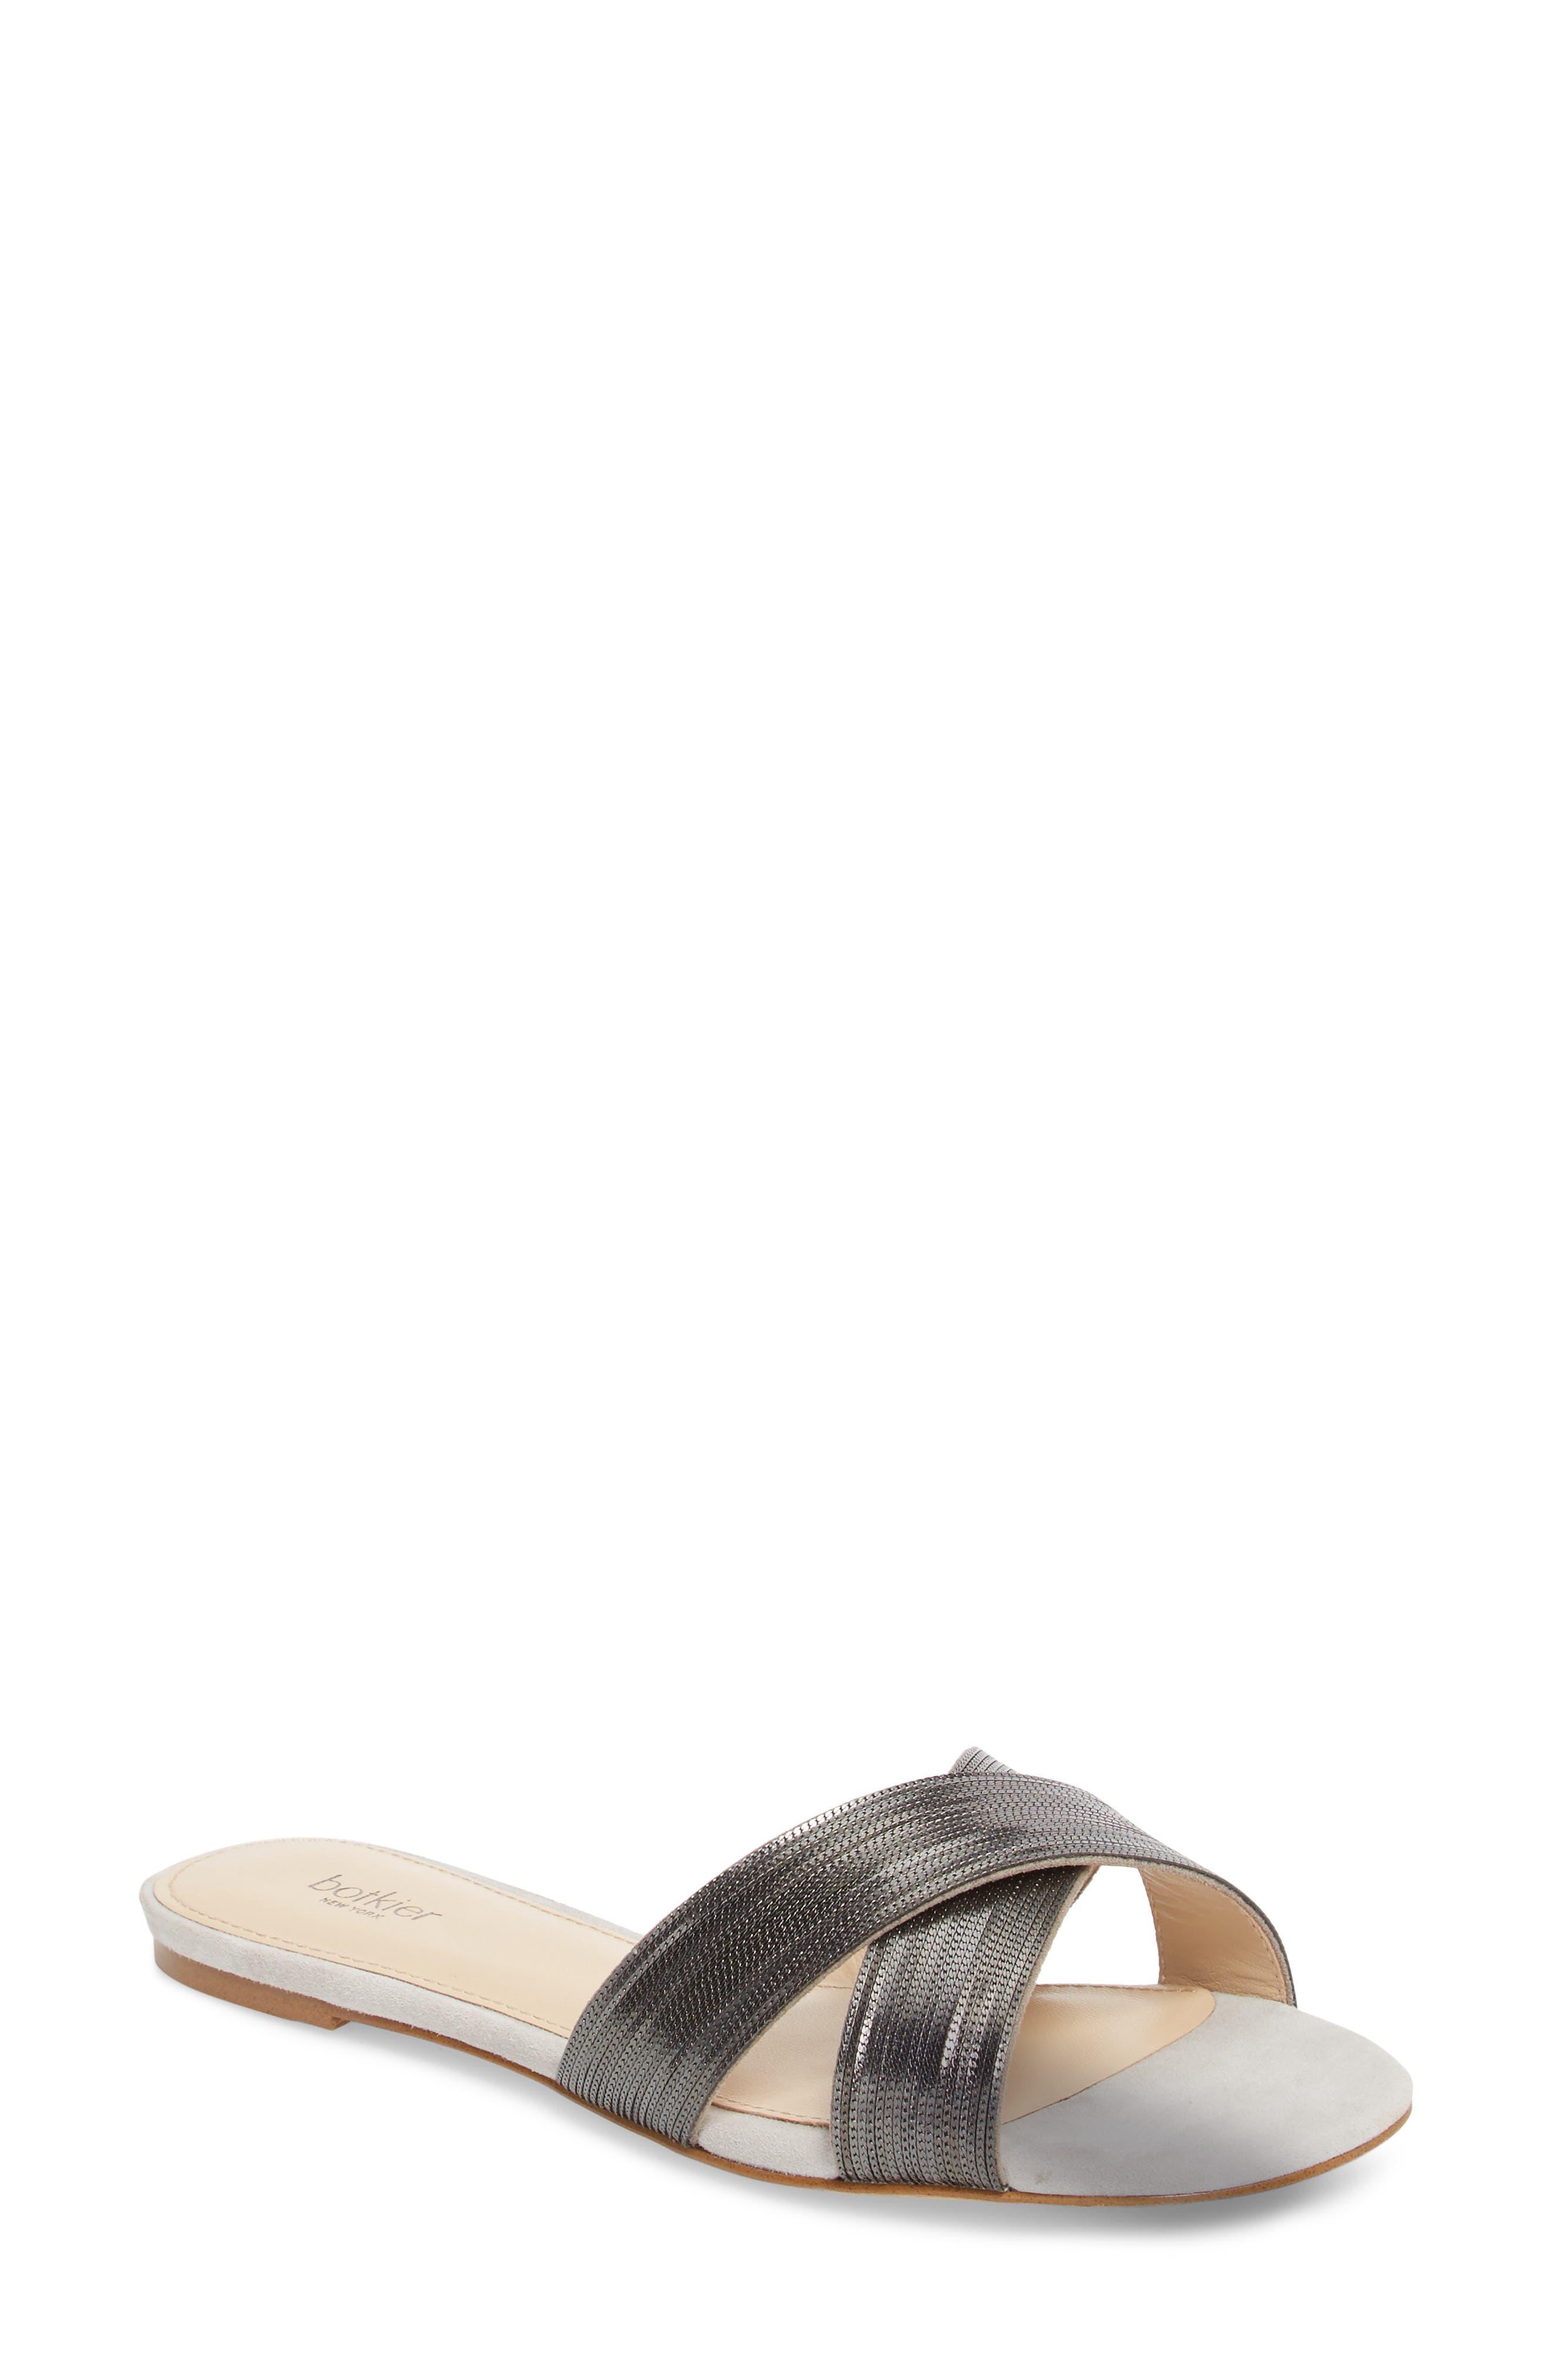 Millie Cross Strap Slide Sandal,                             Main thumbnail 1, color,                             CLAY/ GUNMETAL SUEDE